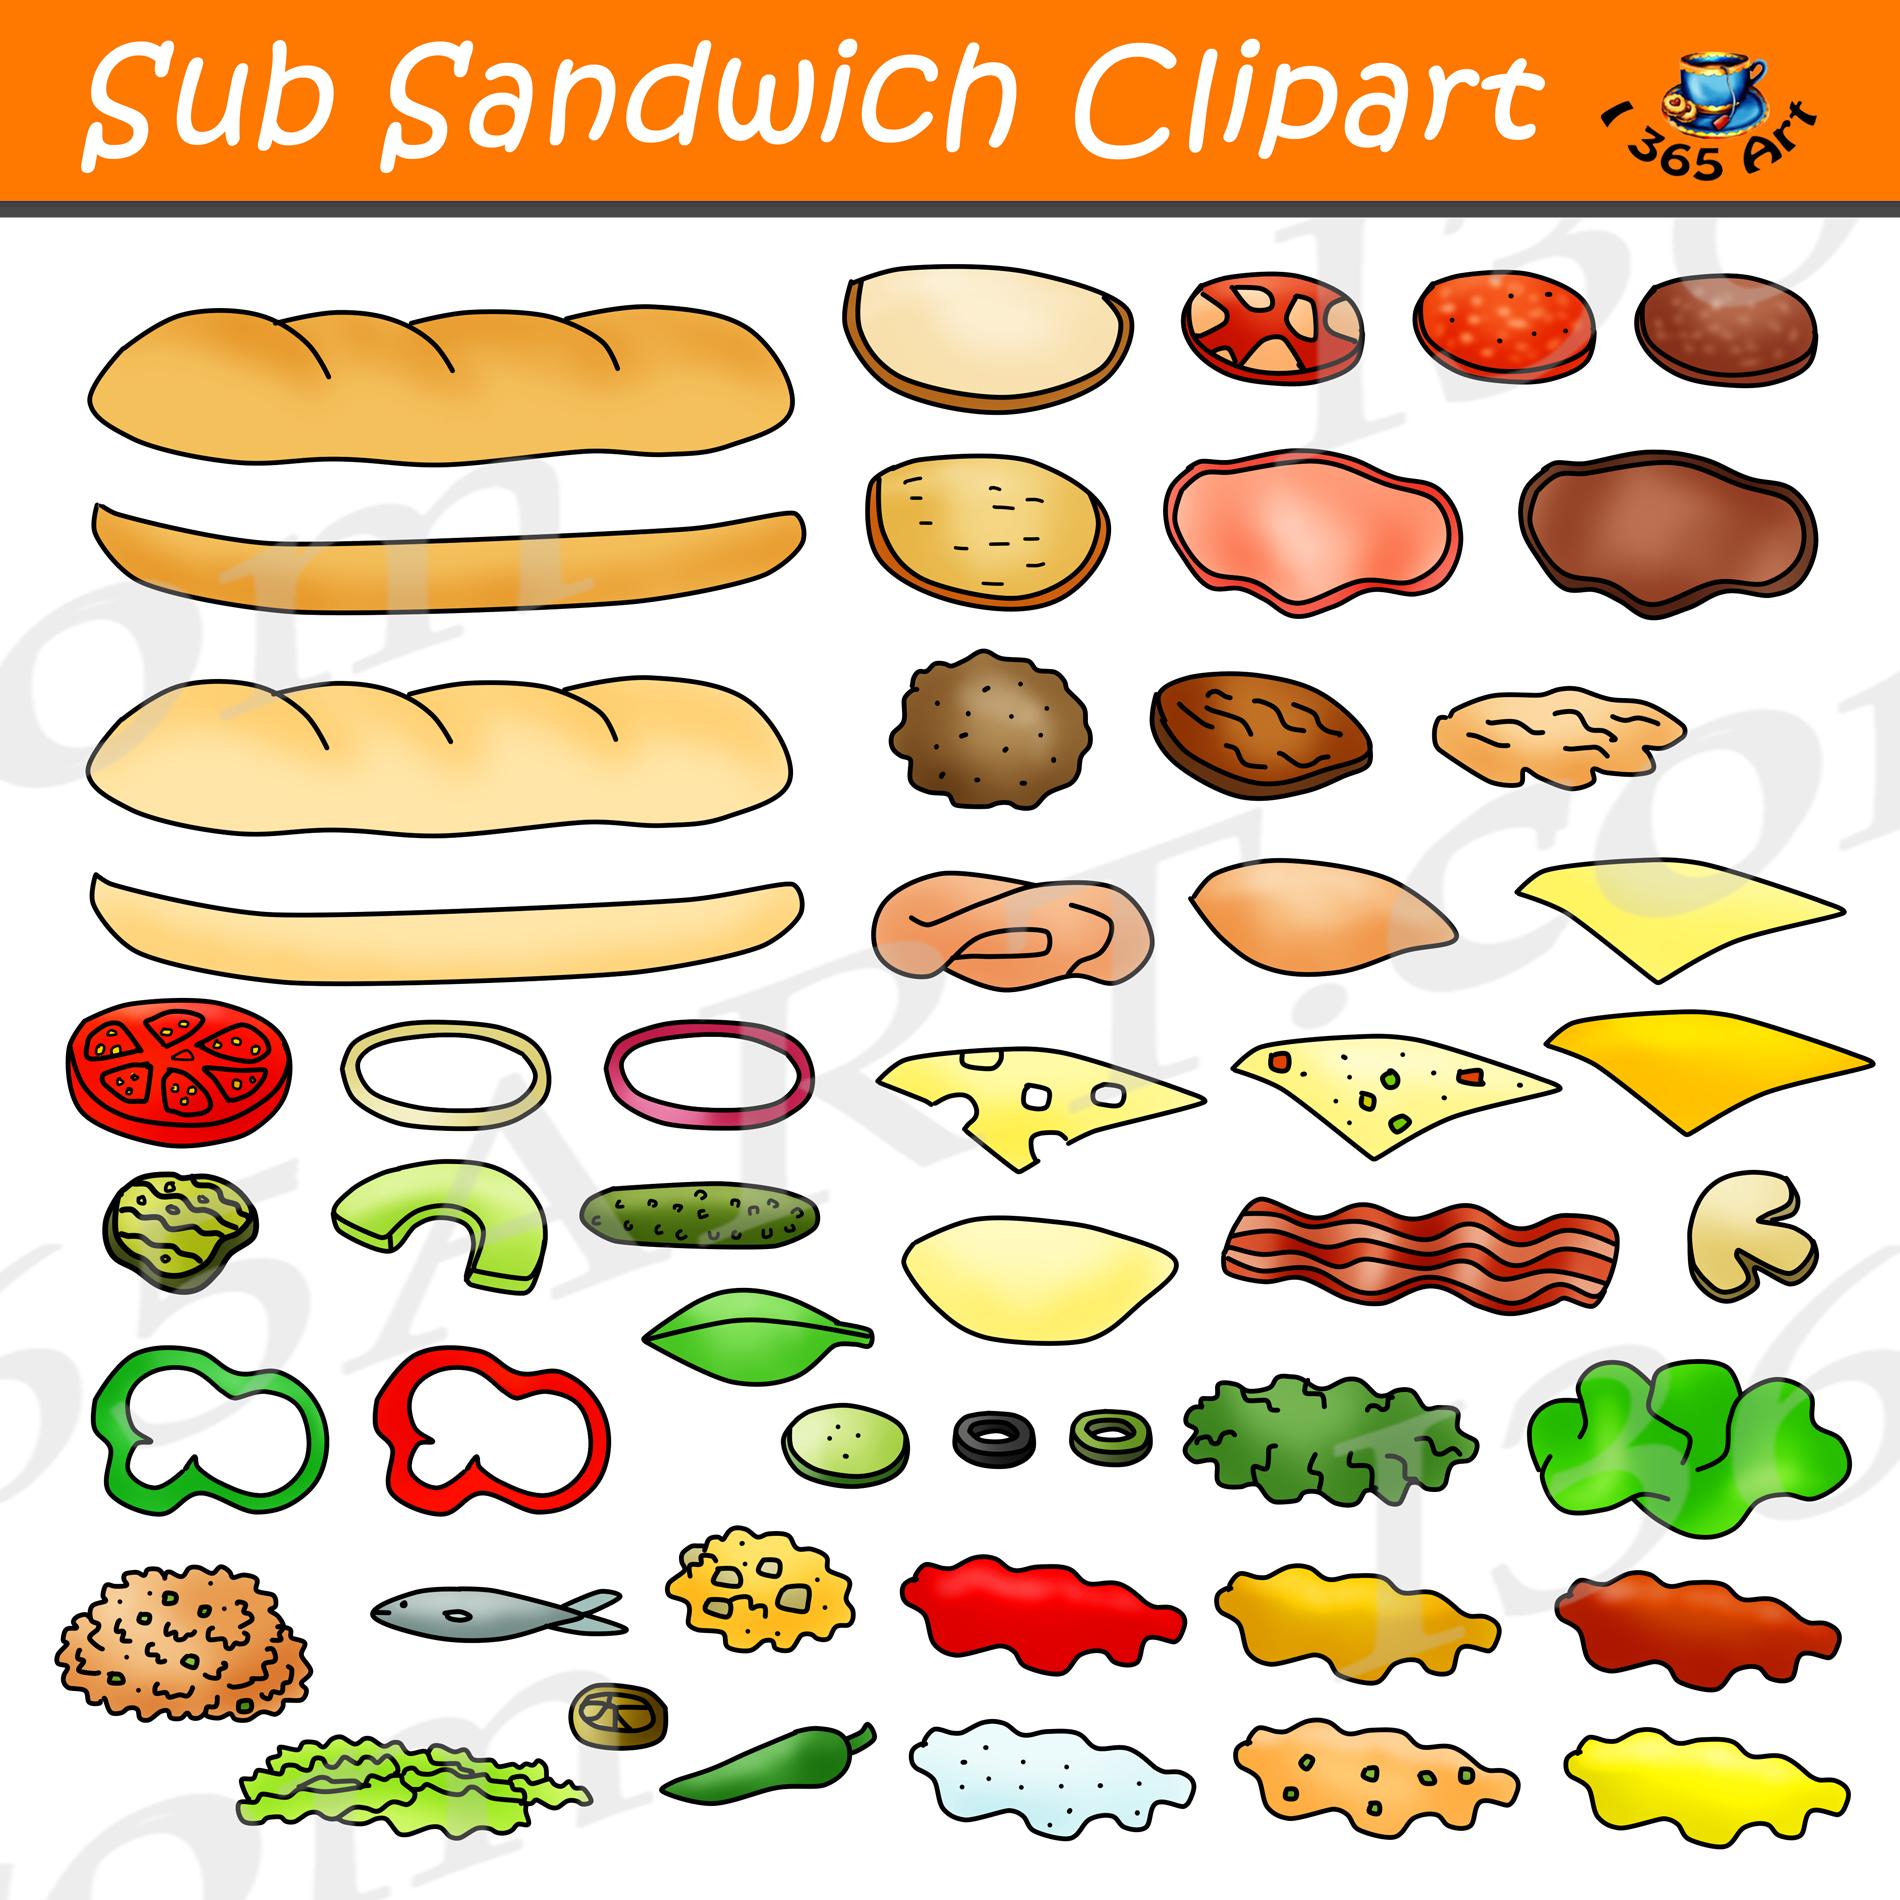 Sub Sandwich Clipart Graphics Commercial Download